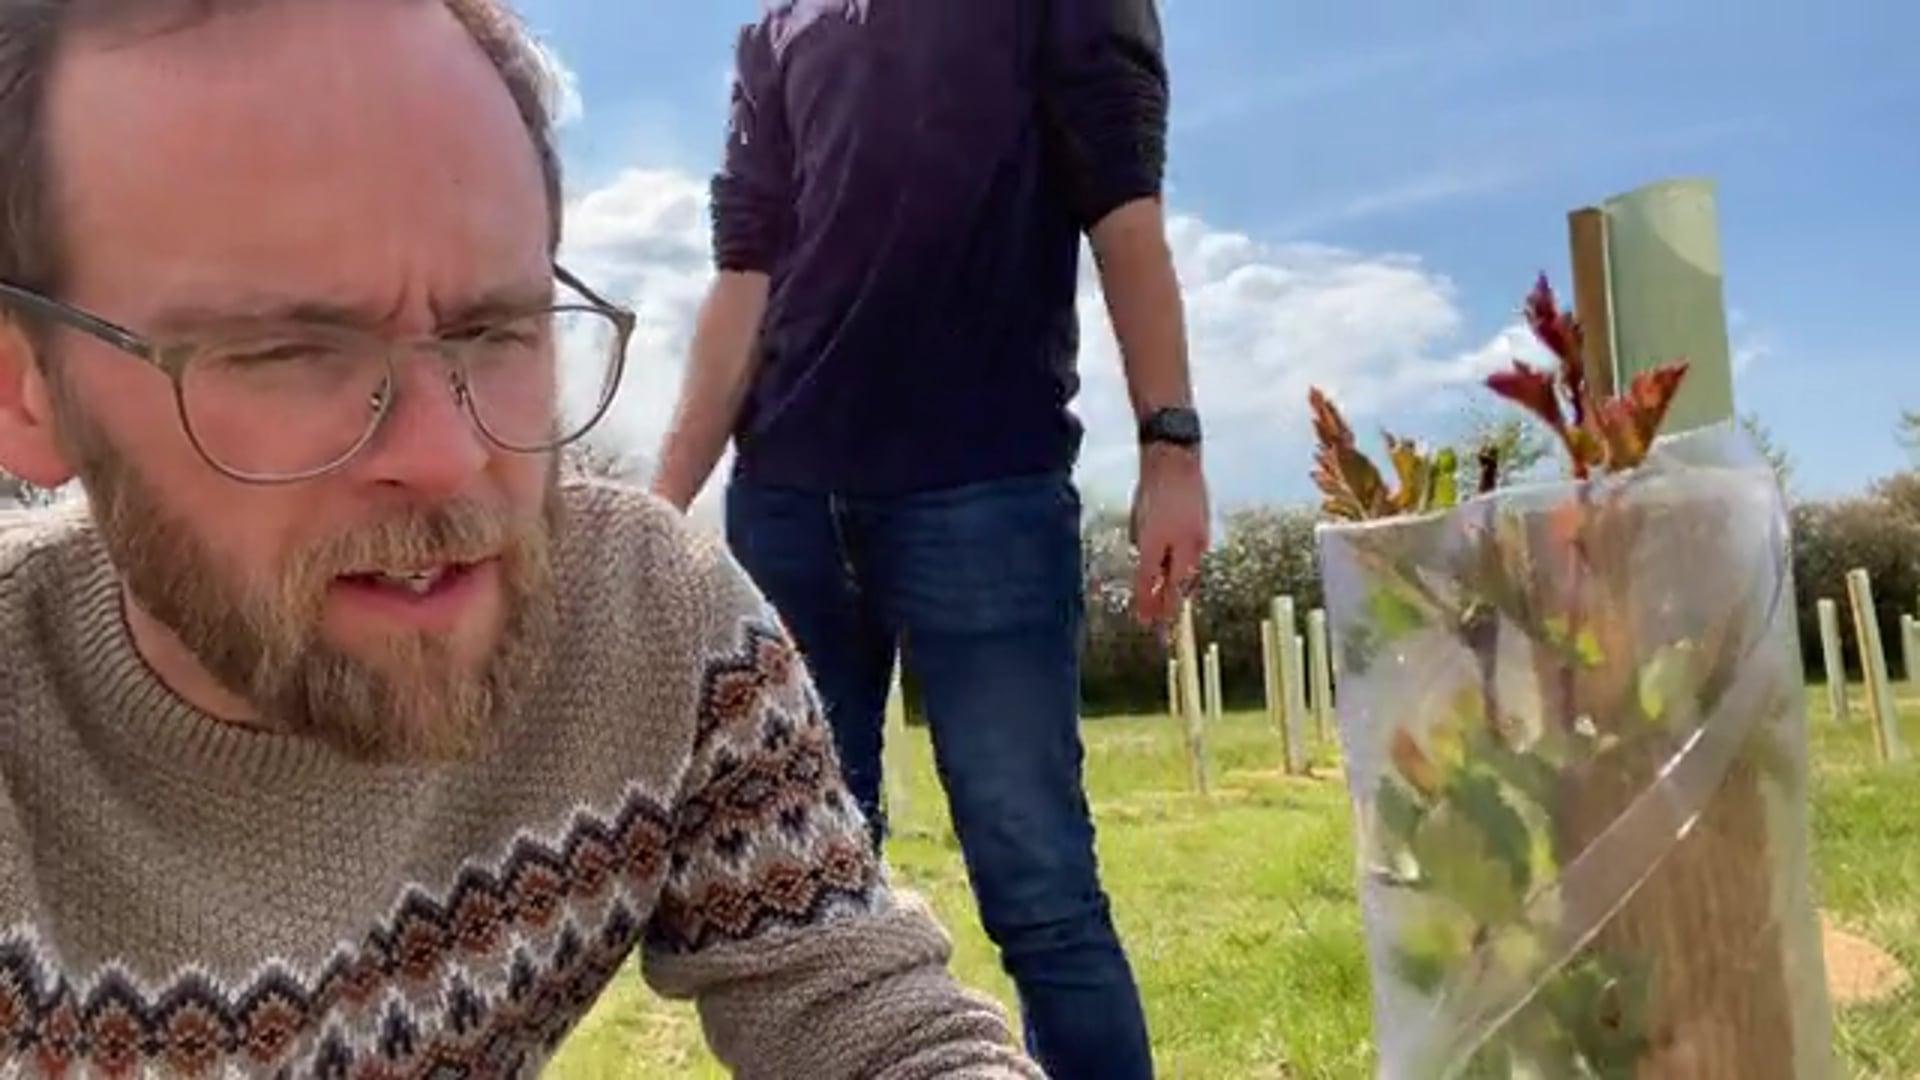 Ninebarrow Woodland Update - Sunday 2nd May